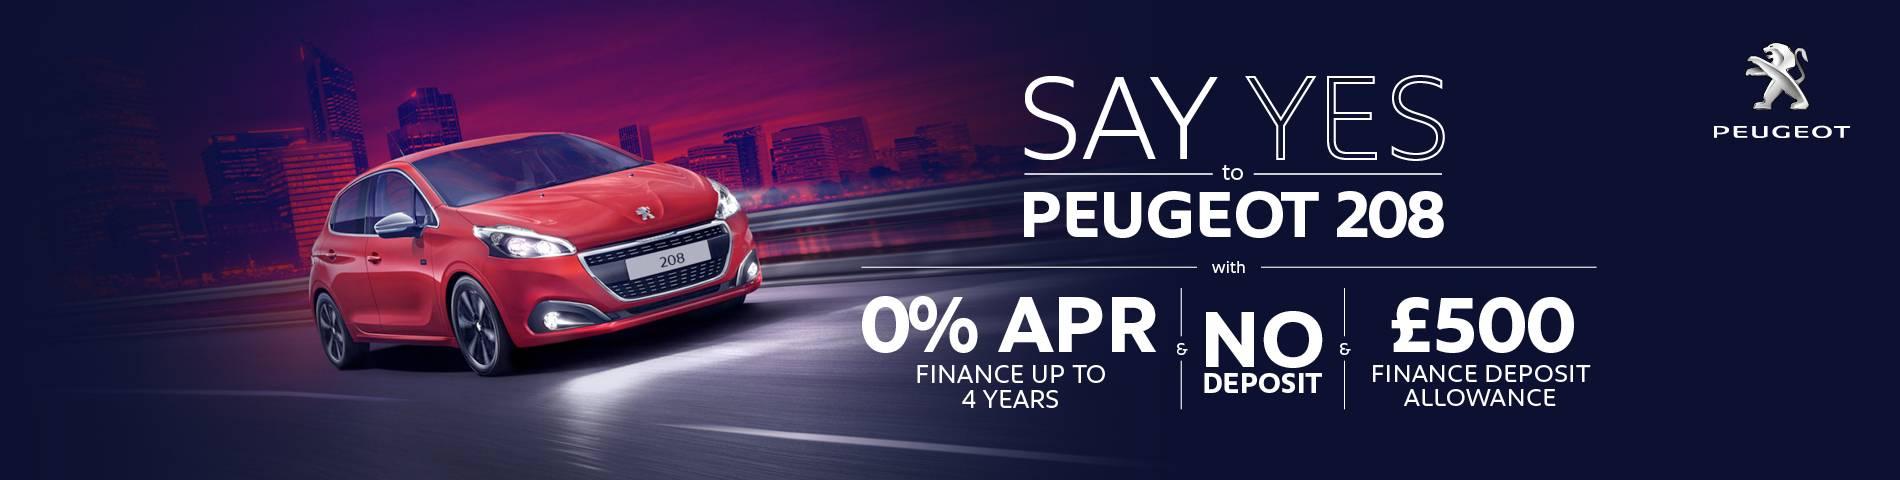 Peugeot 208 0% APR